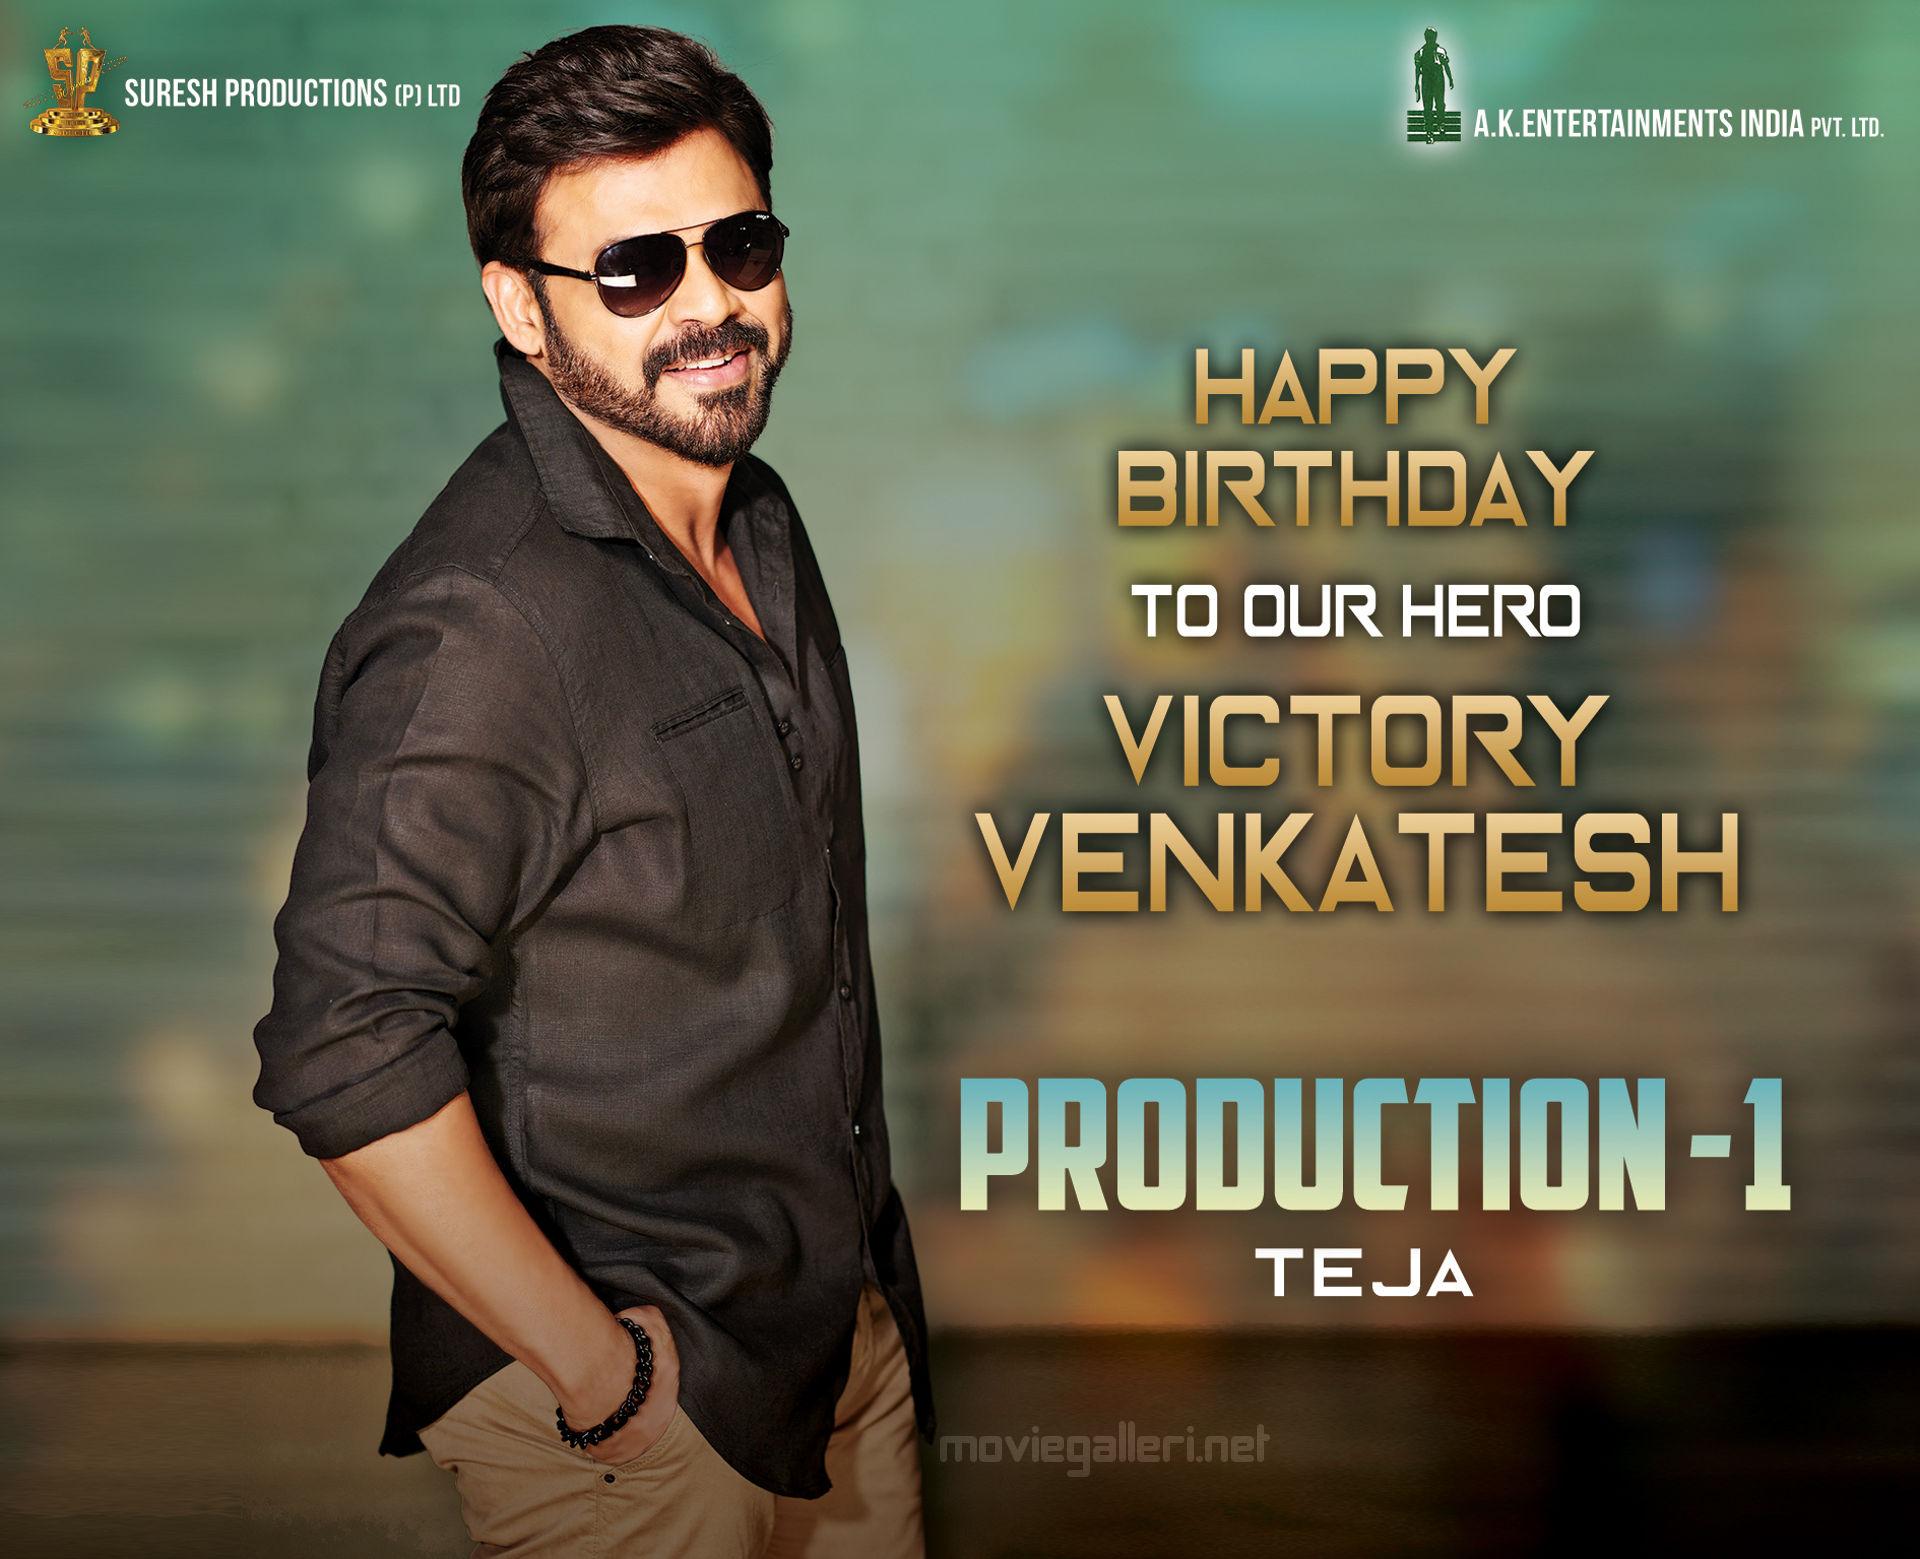 Happy Birthday Victory Venkatesh Production No 1 Teja Poster